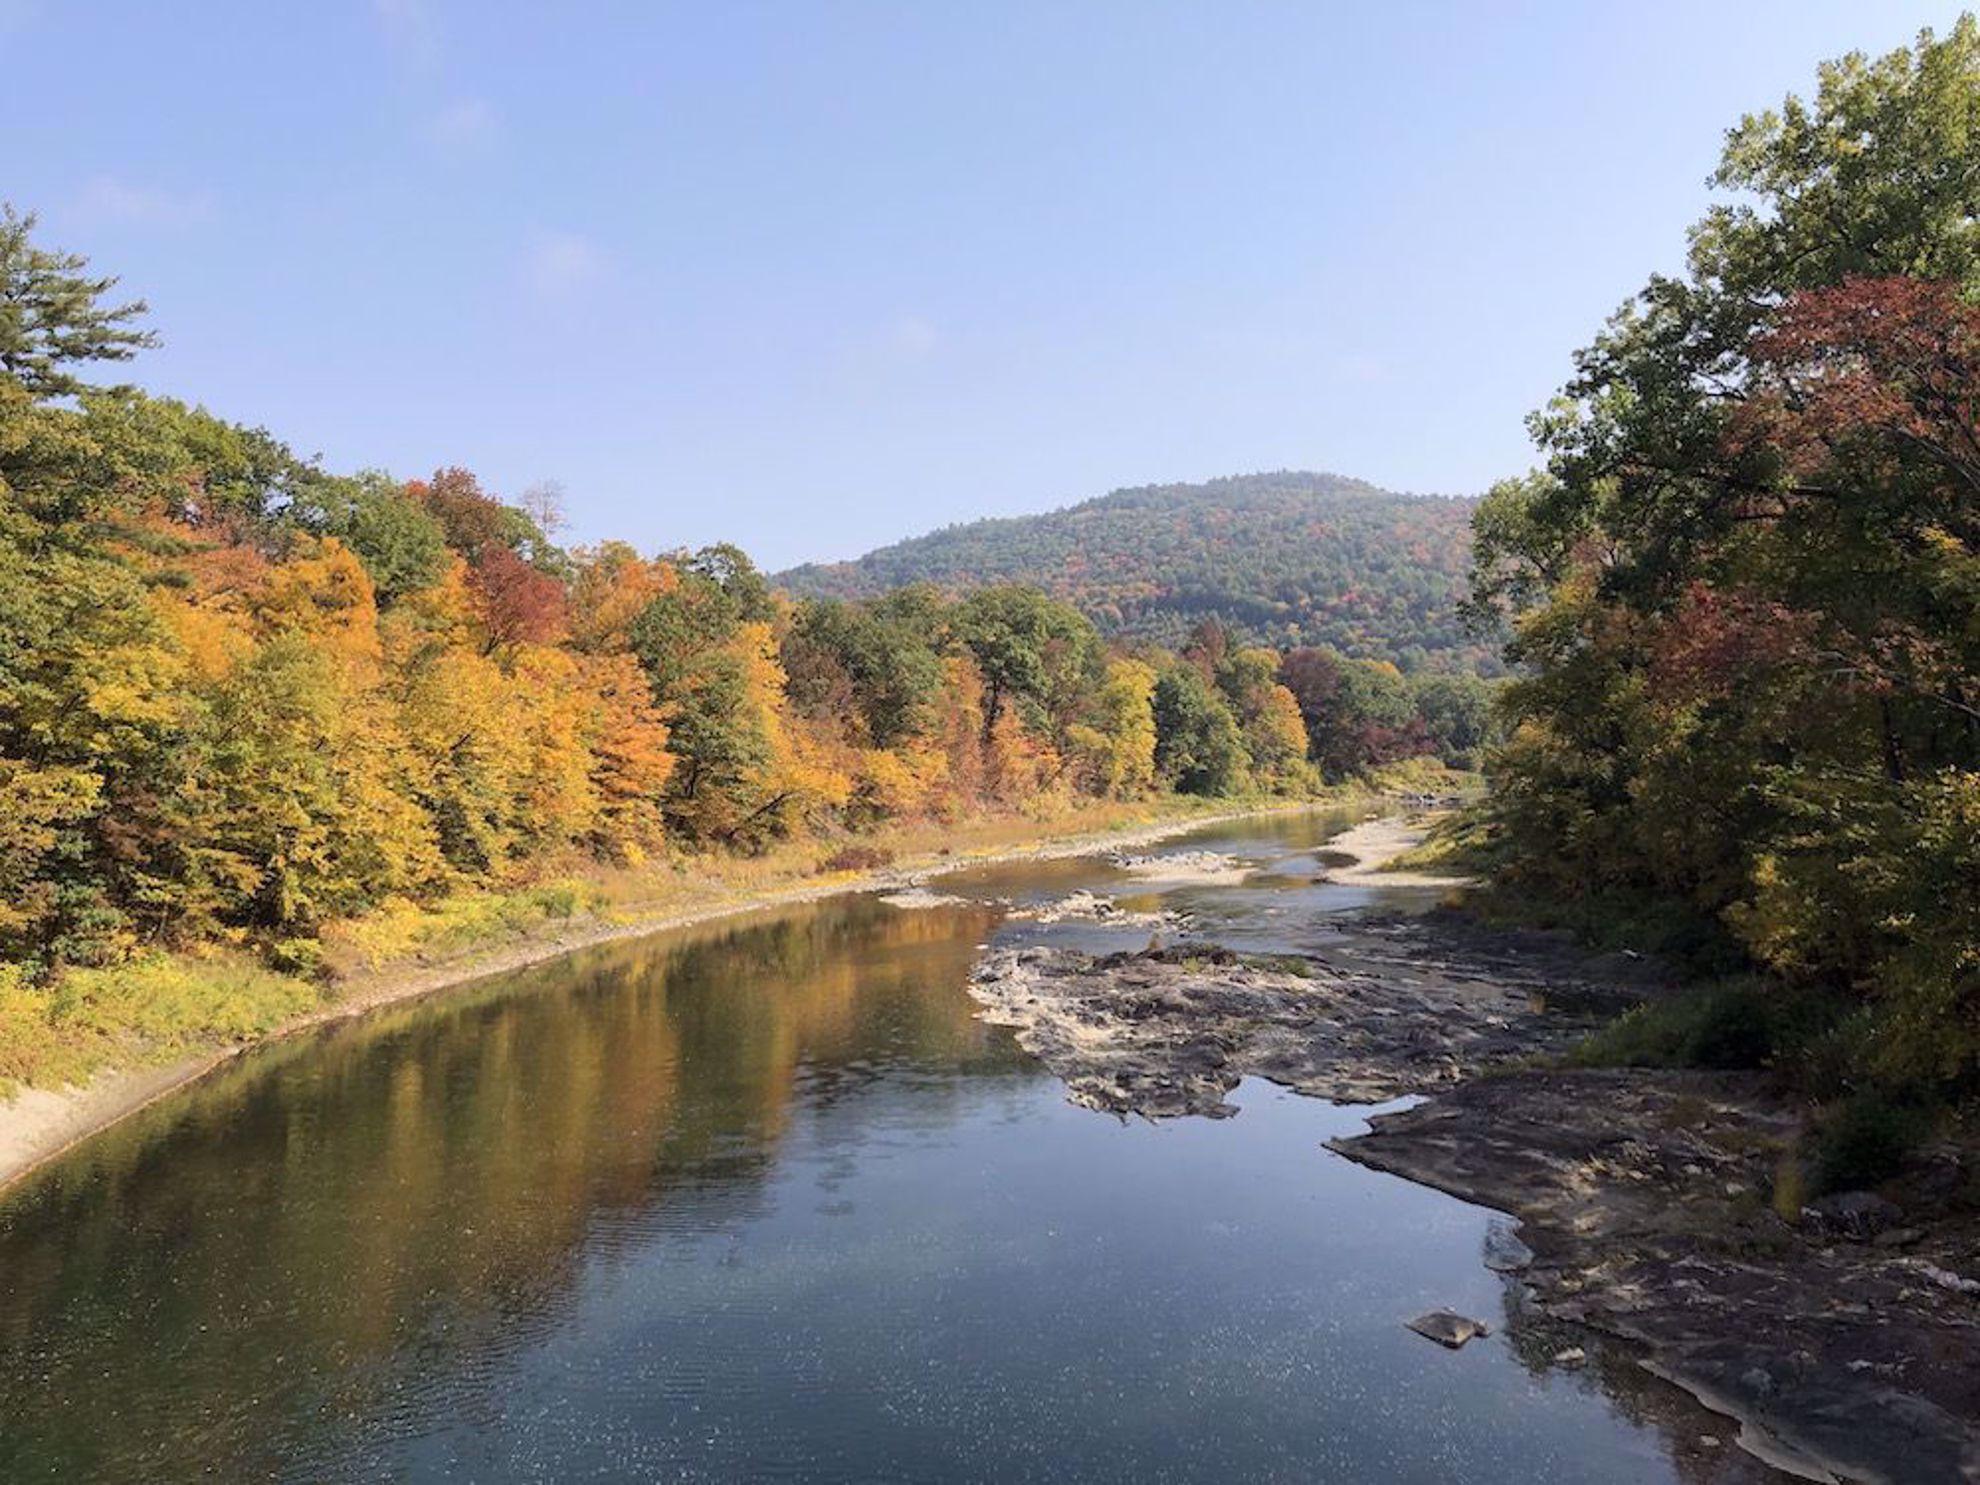 Fall on the Ottauquechee River, Woodstock